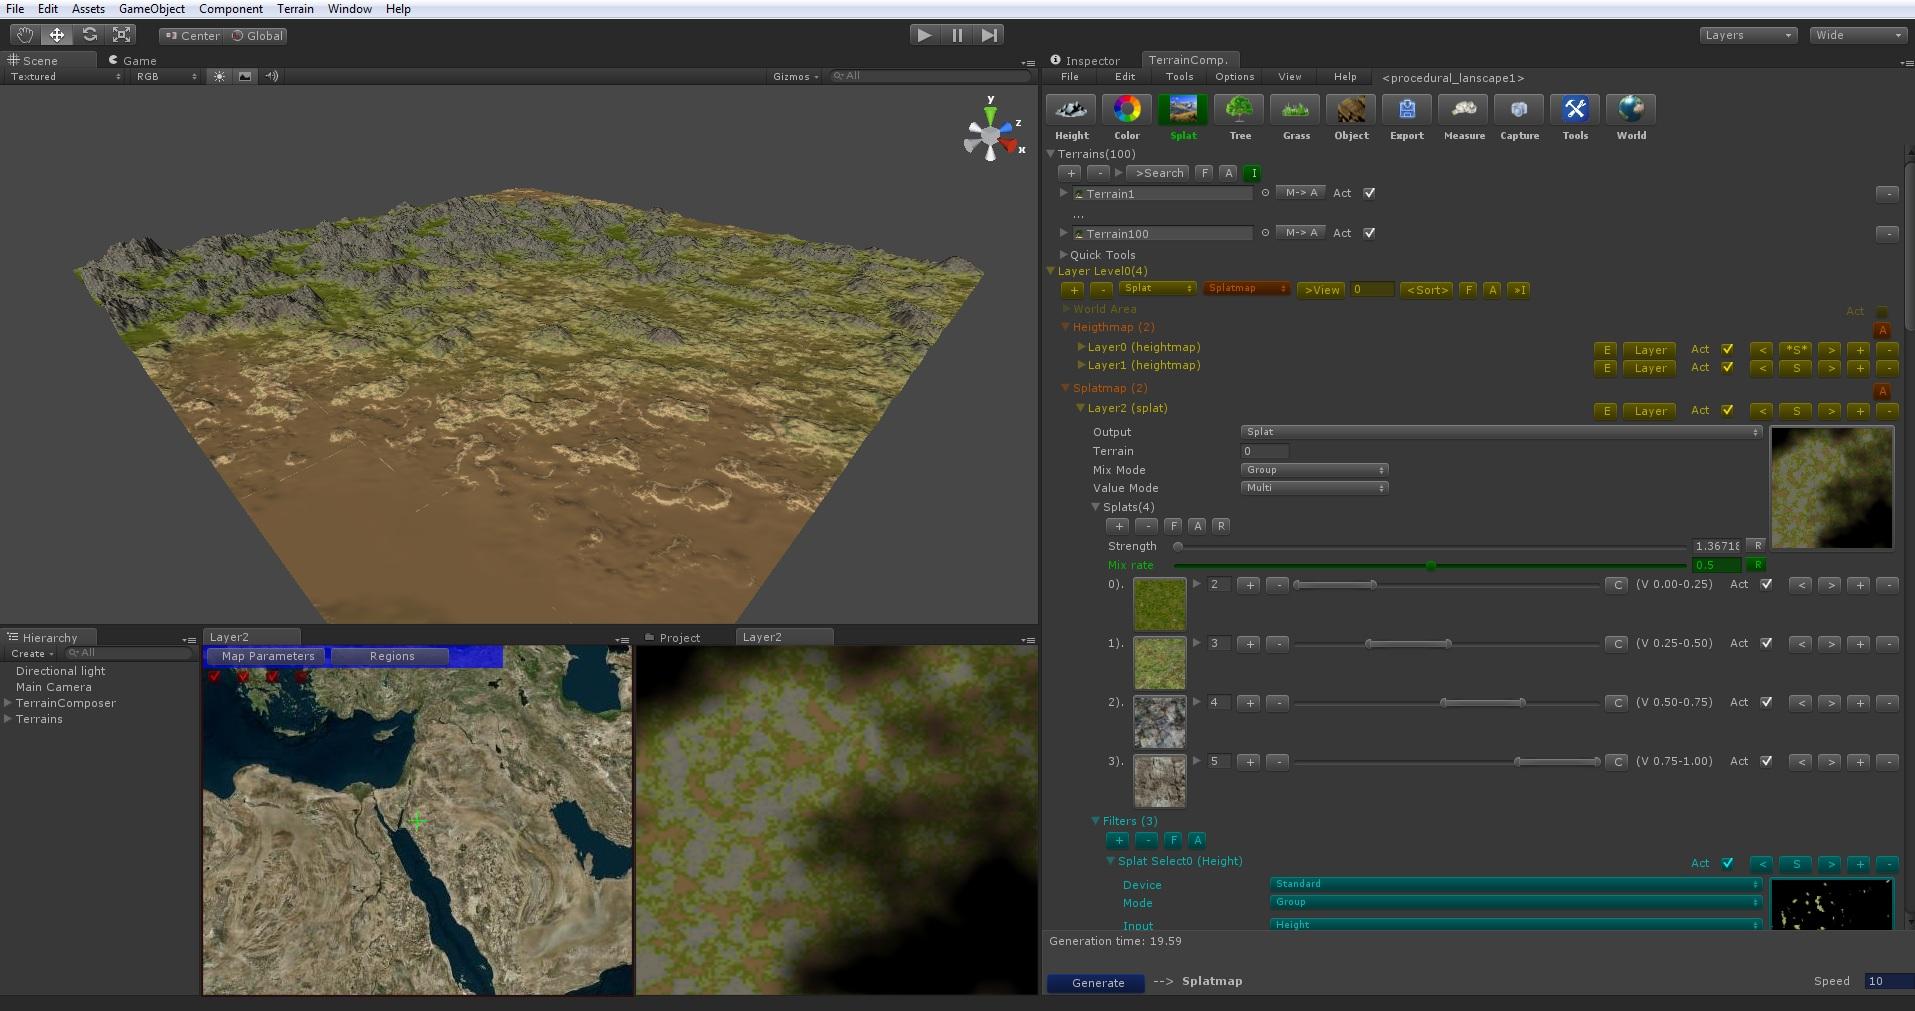 $terrain_mix.jpg